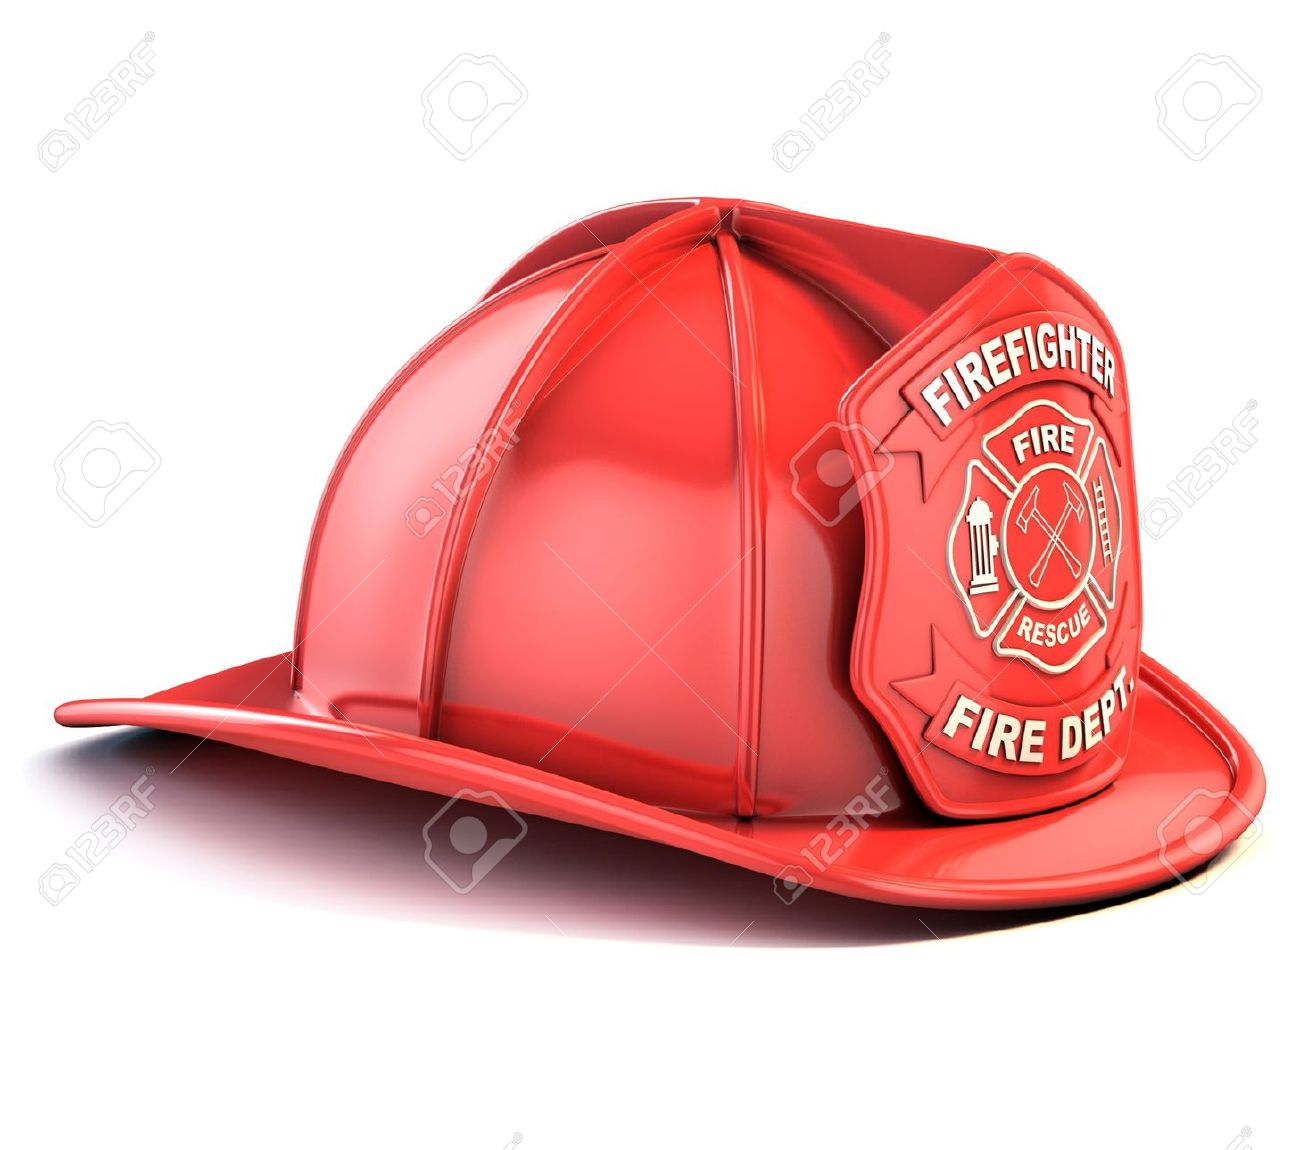 fireman helmet Stock Photo - 12330808